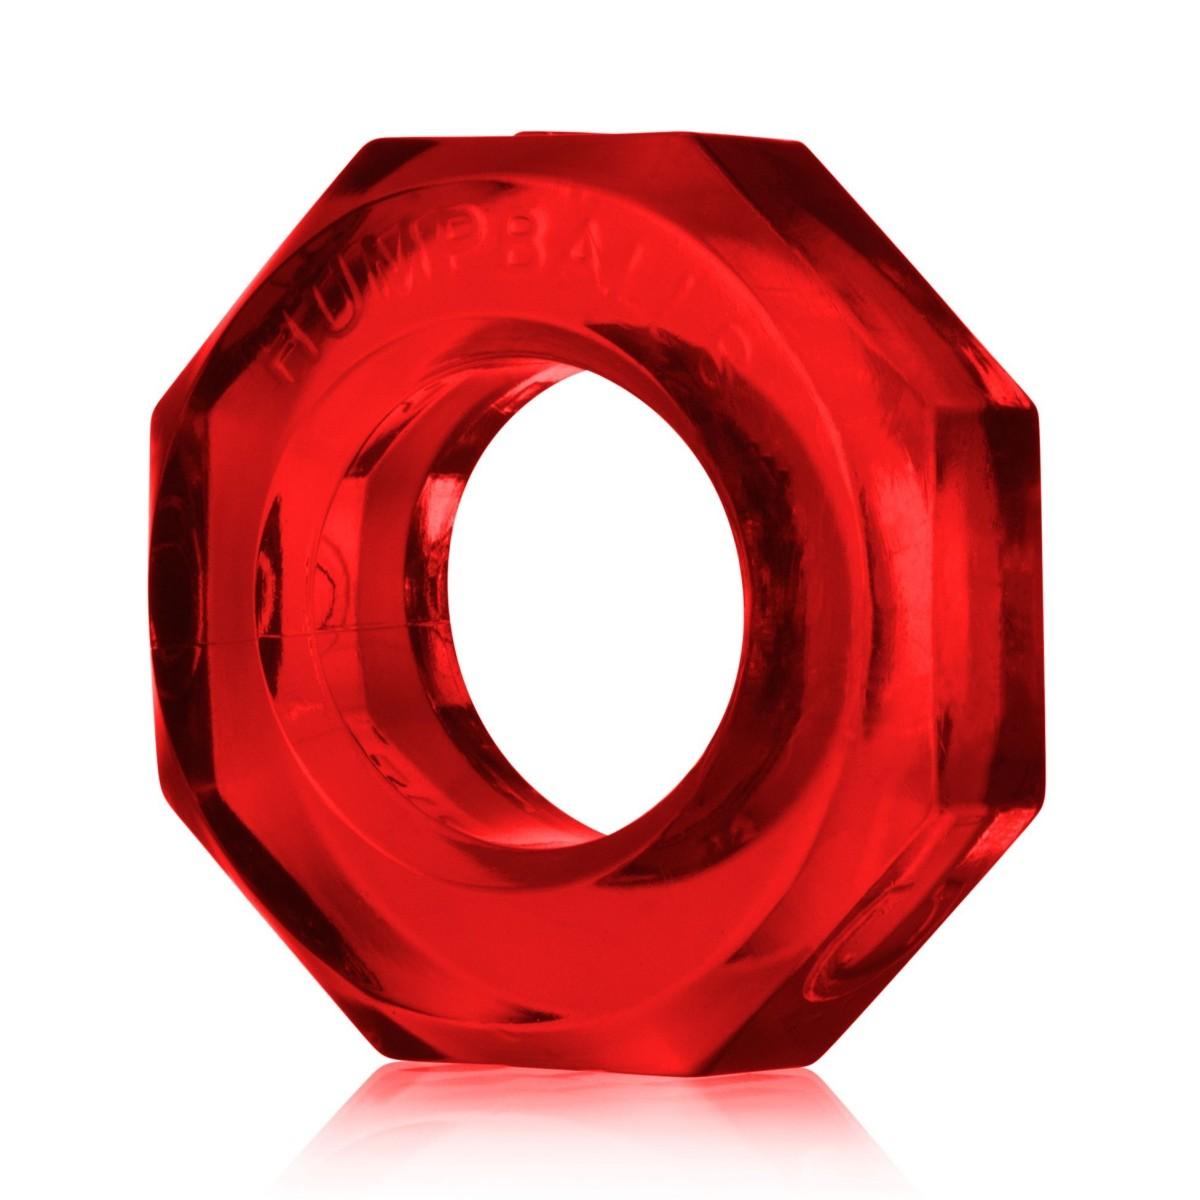 Oxballs Humpballs Cock Ring Ruby